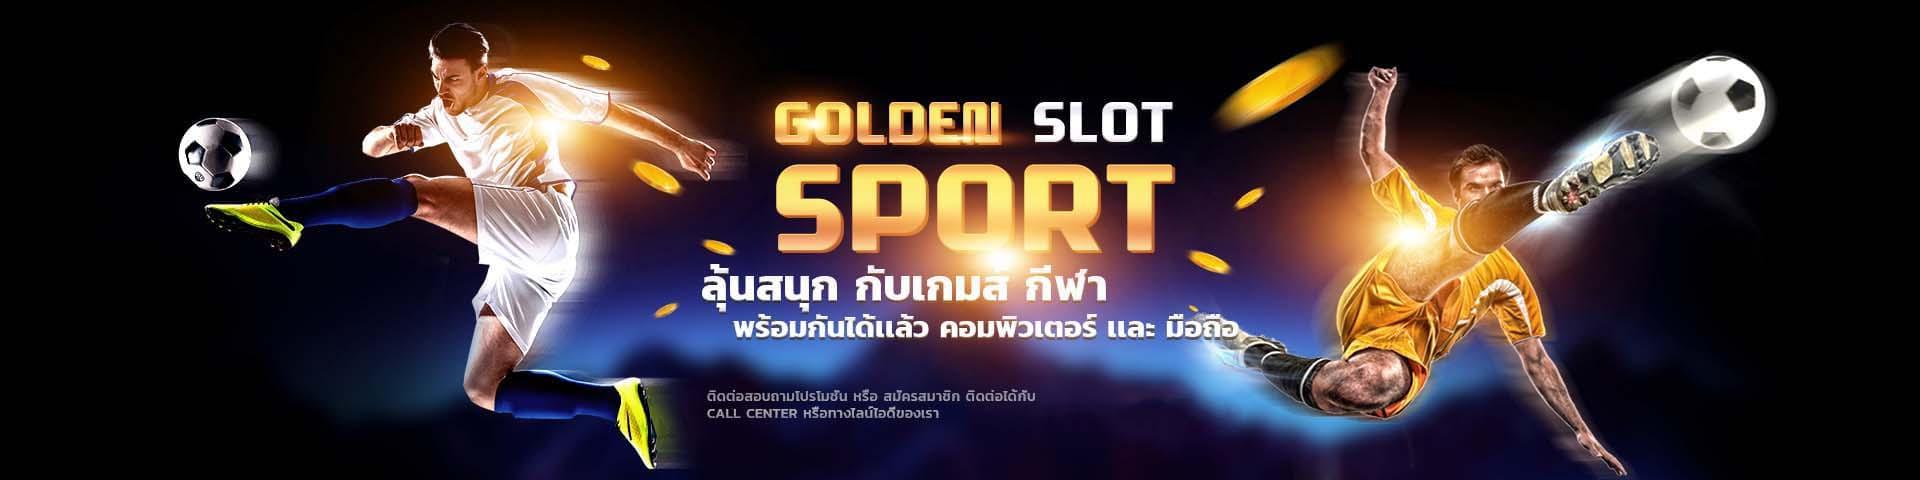 Goldenslot sport เดิมพันกีฬา